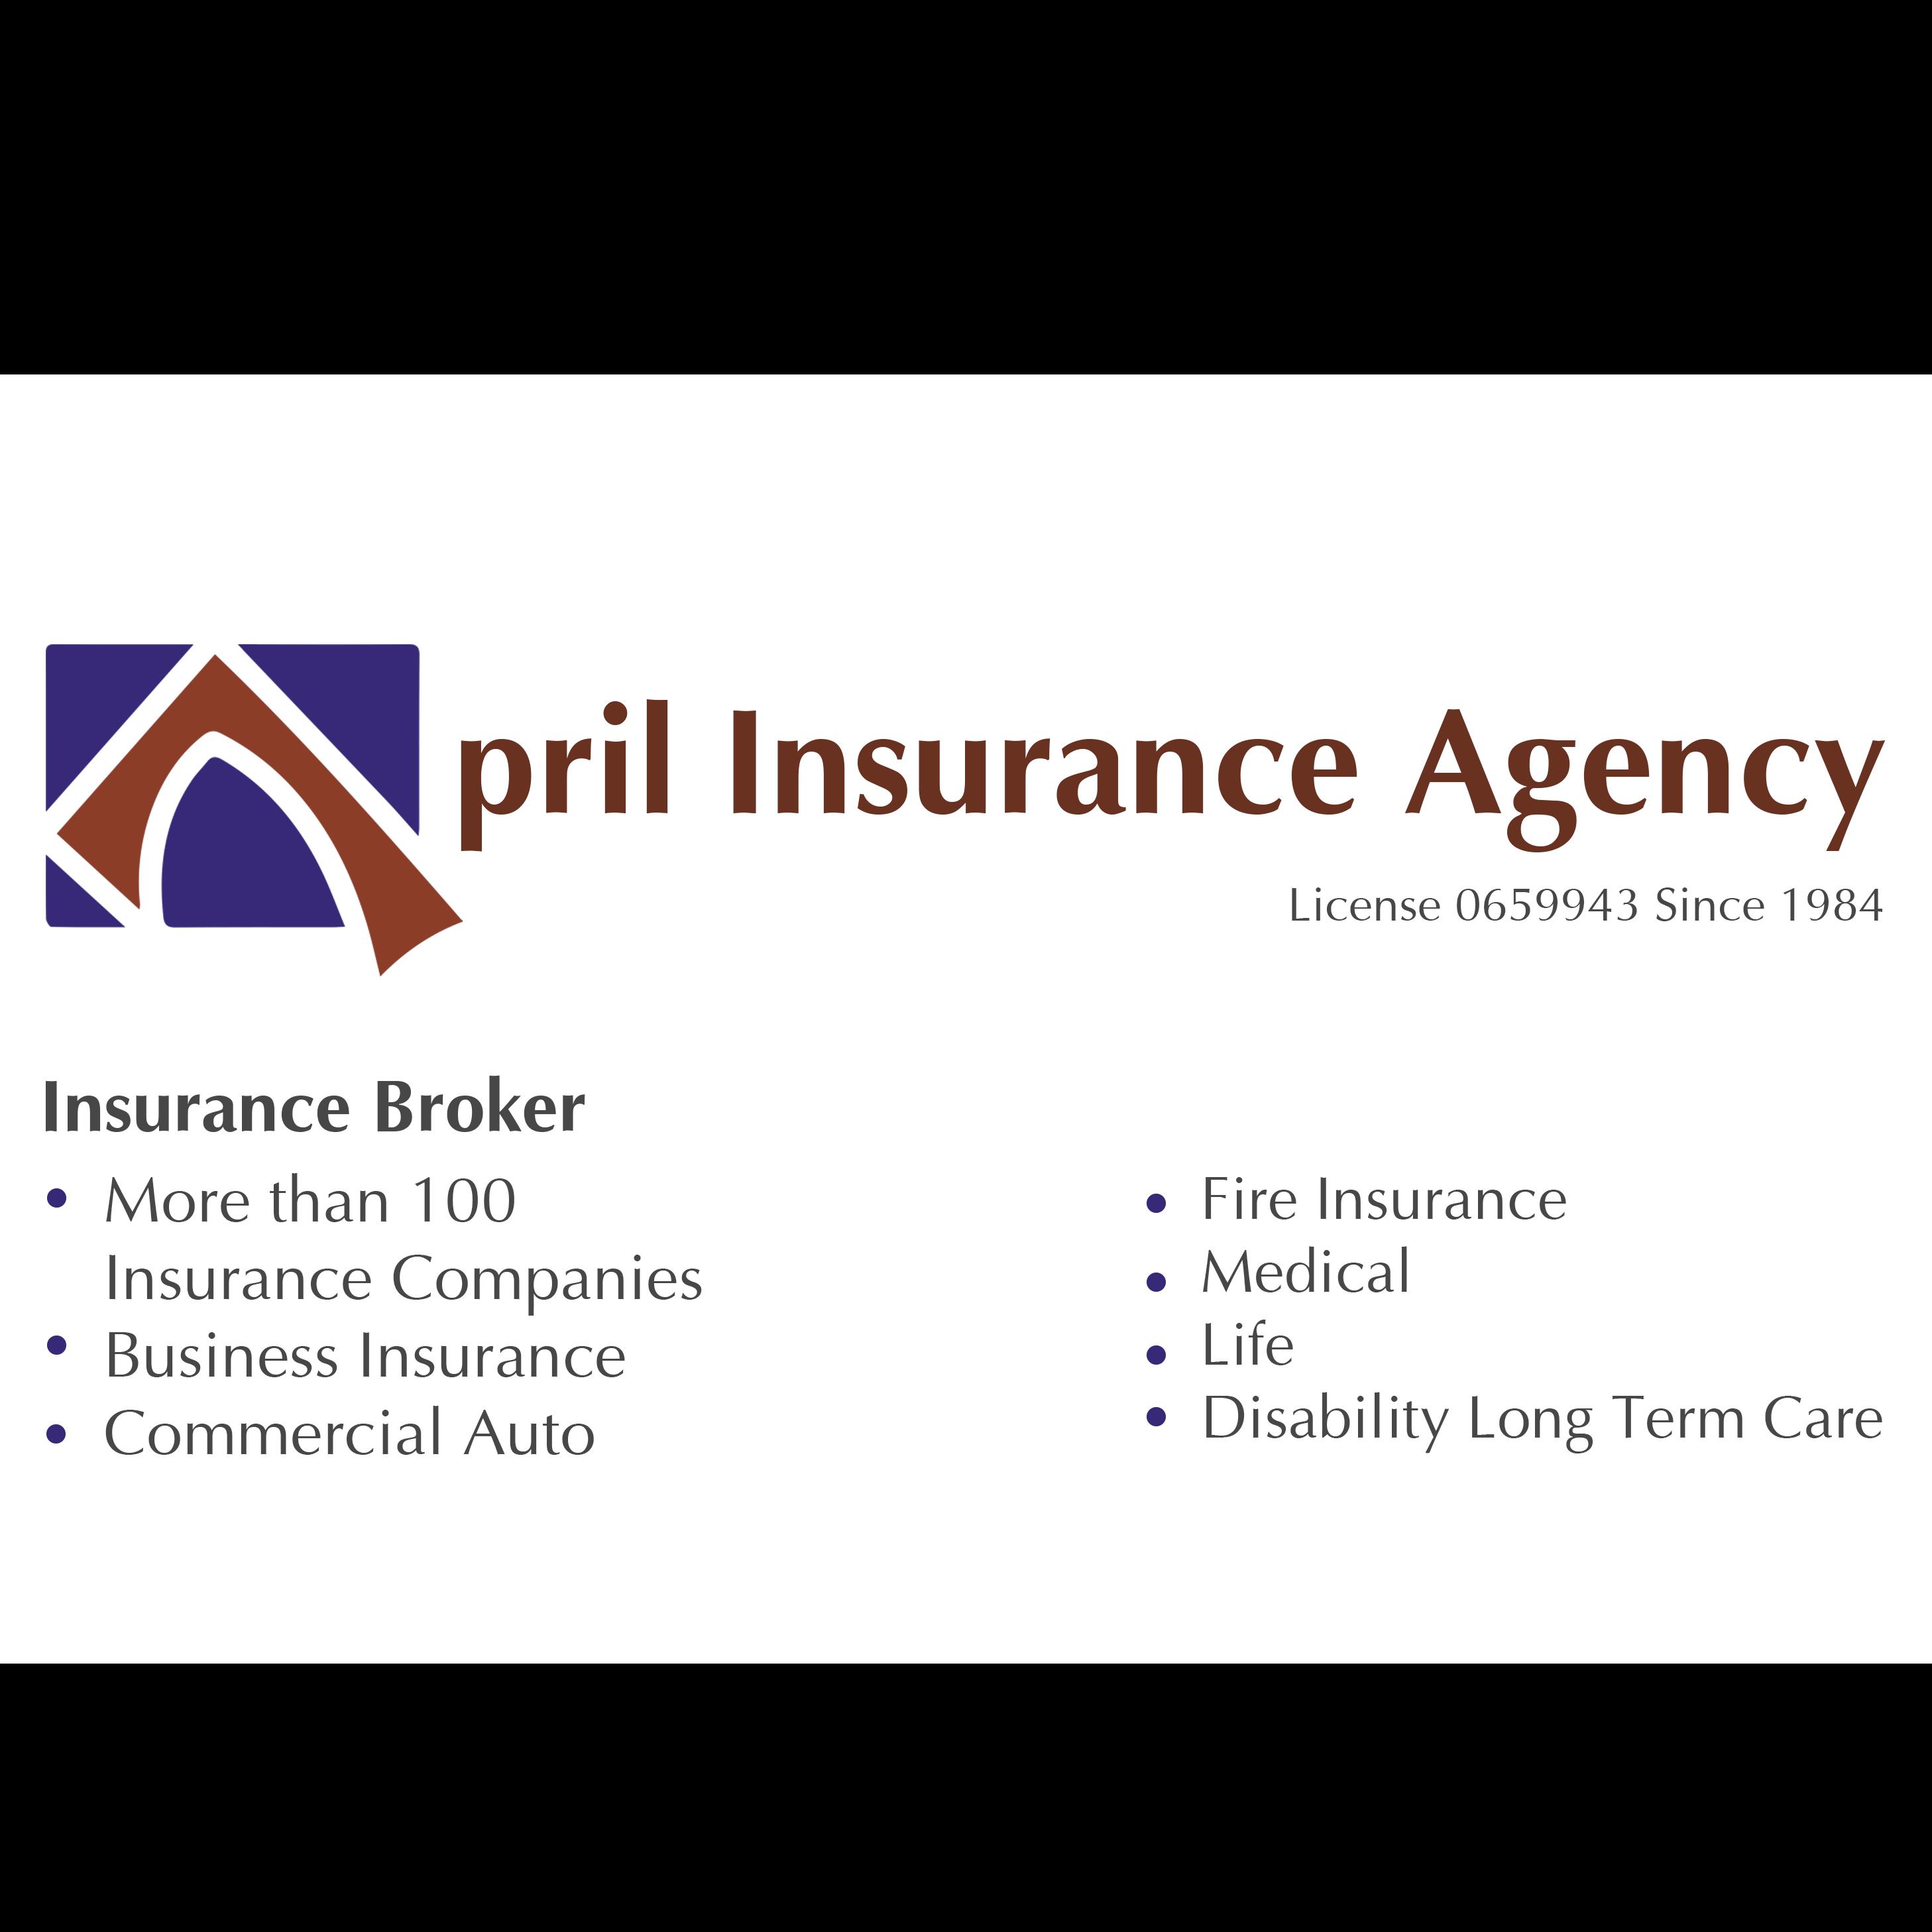 April Insurance agency